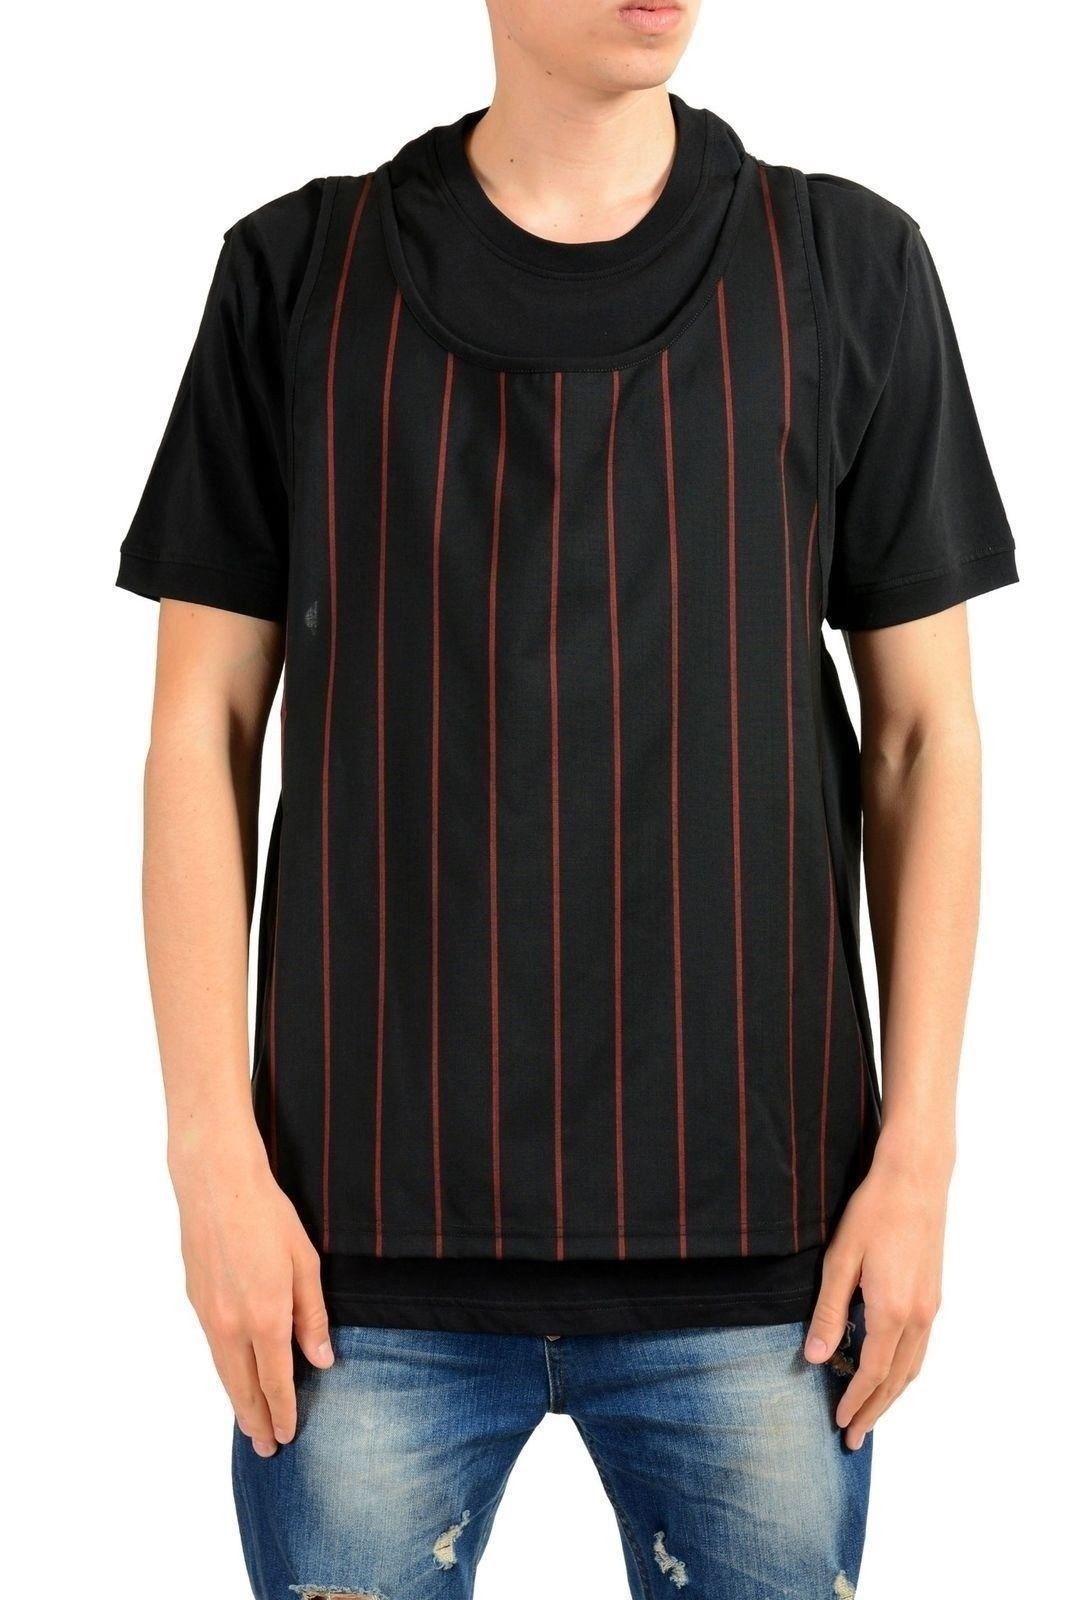 5881ef87 72.24 | Versace Versus Men's Wool Layered Crewneck T-Shirt US M IT ...